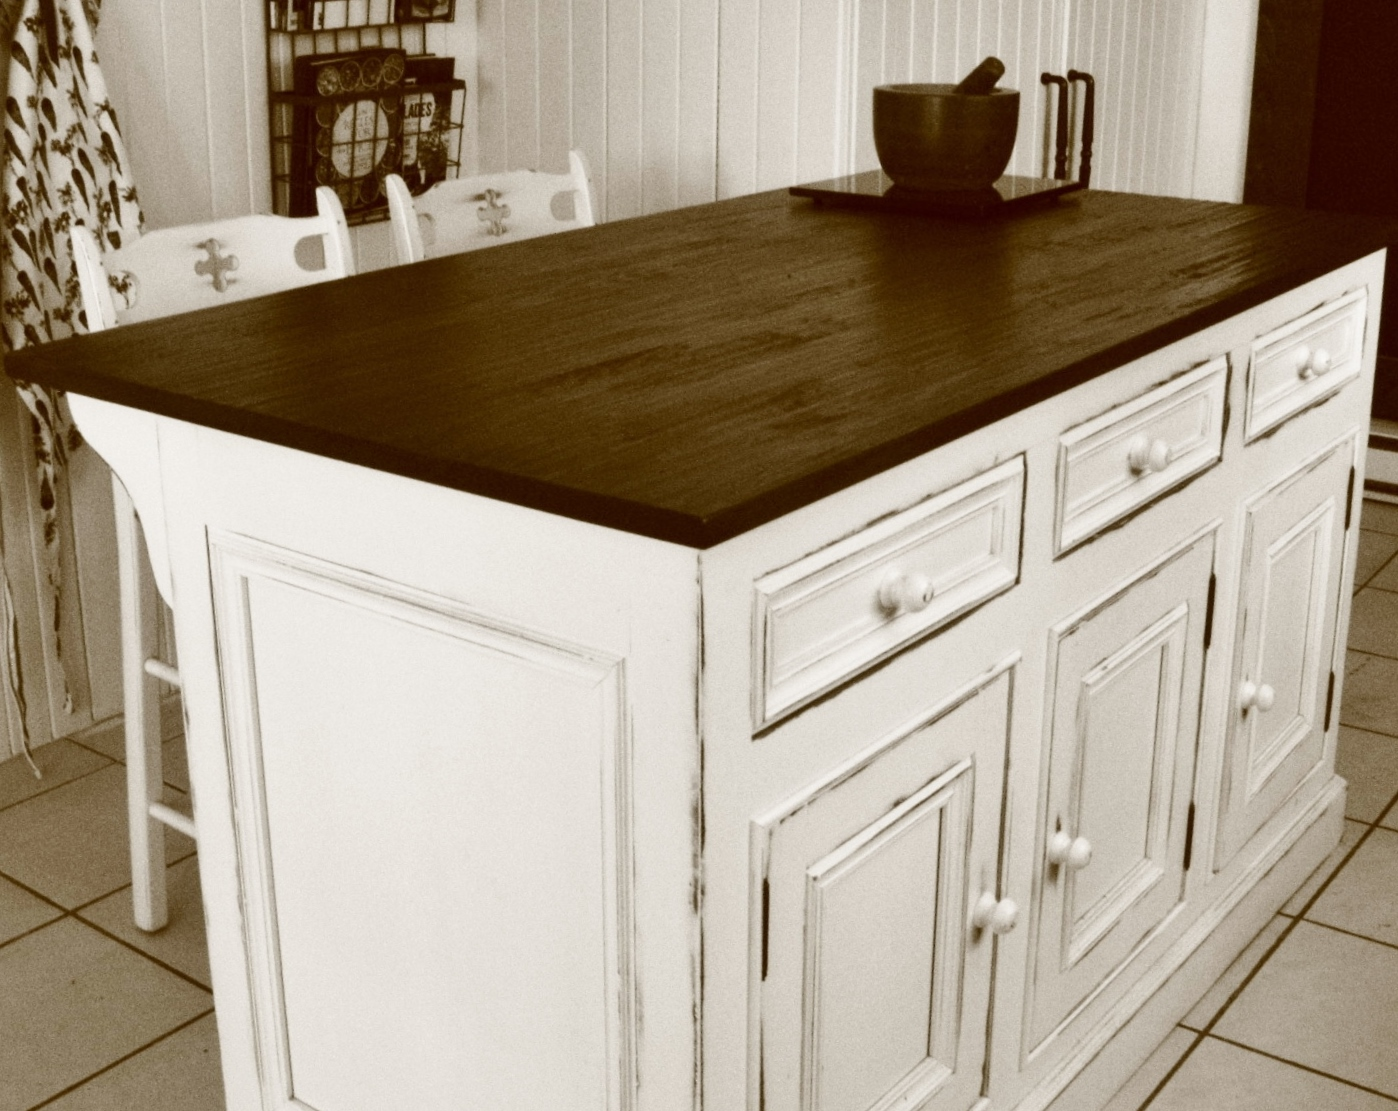 lots de cuisine sur mesure en bois massif meubles hochelaga 1967. Black Bedroom Furniture Sets. Home Design Ideas